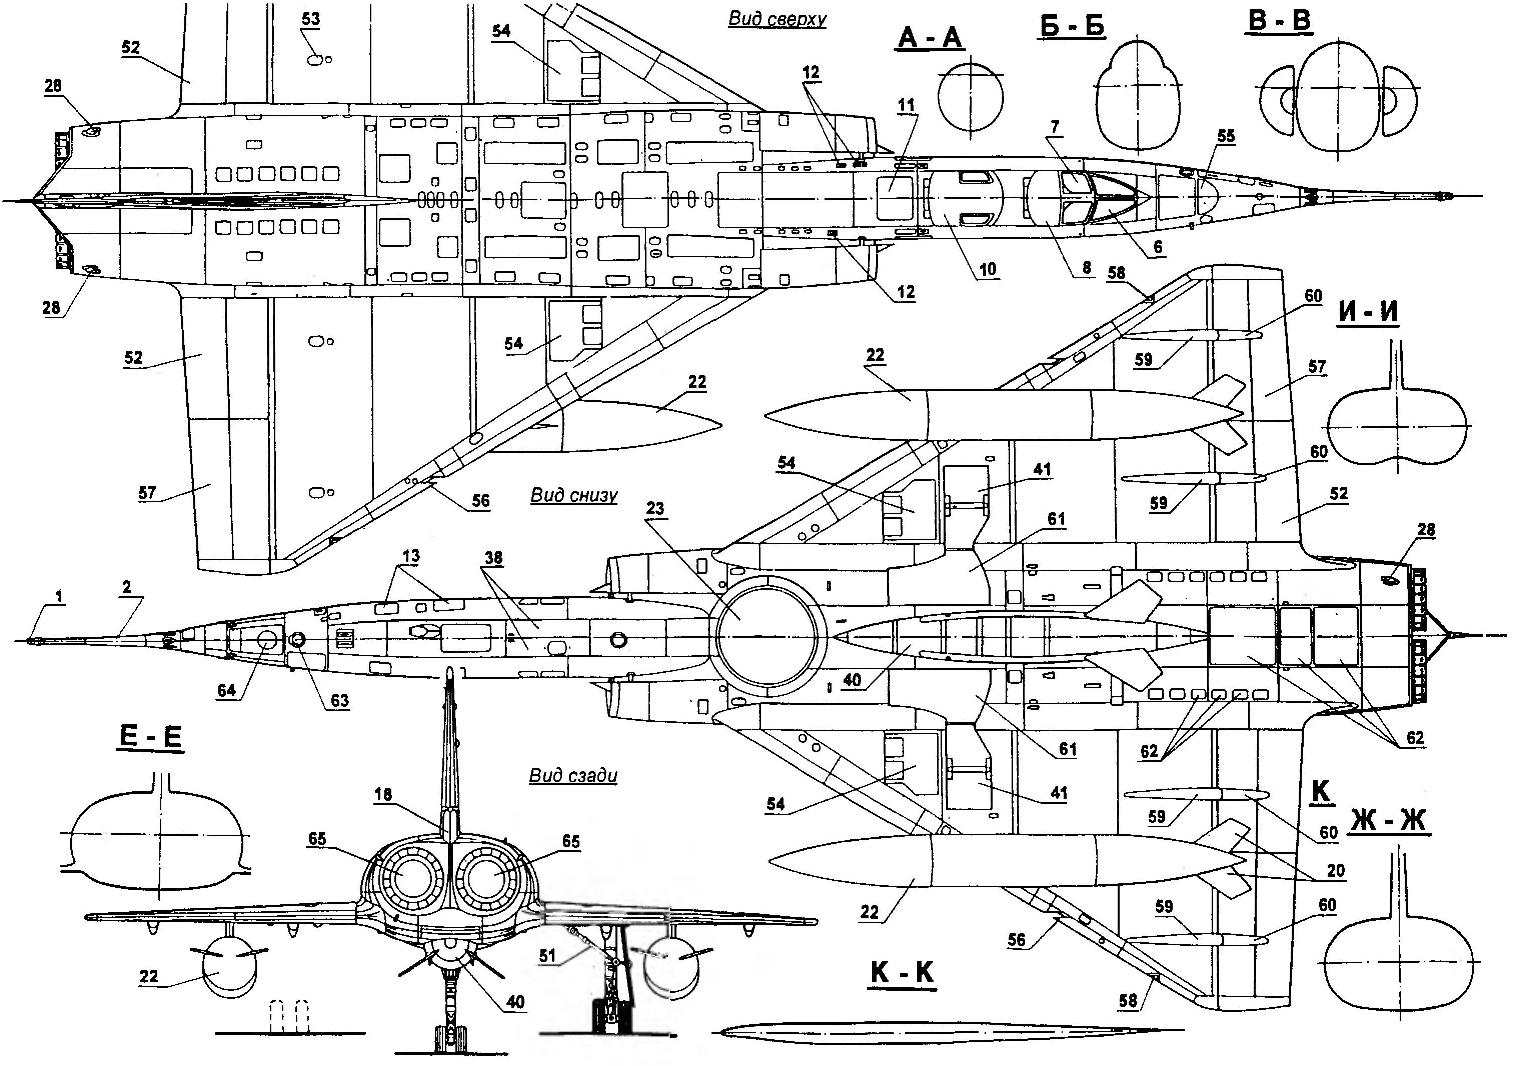 Стратегический бомбардировщик MIRAGE IVA